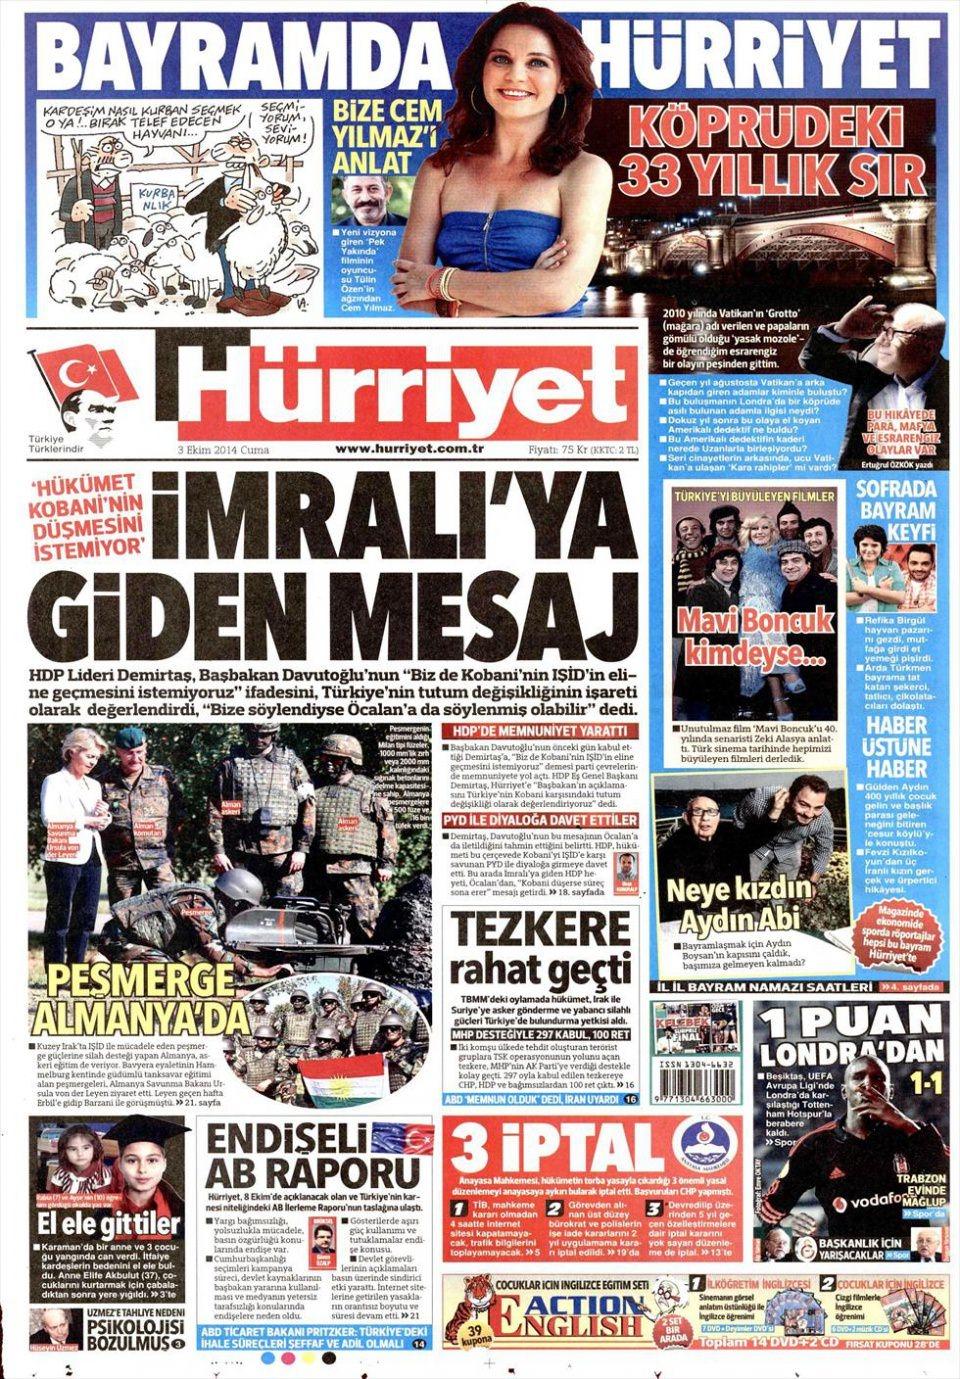 3 Ekim 2014 gazete manşetleri 10